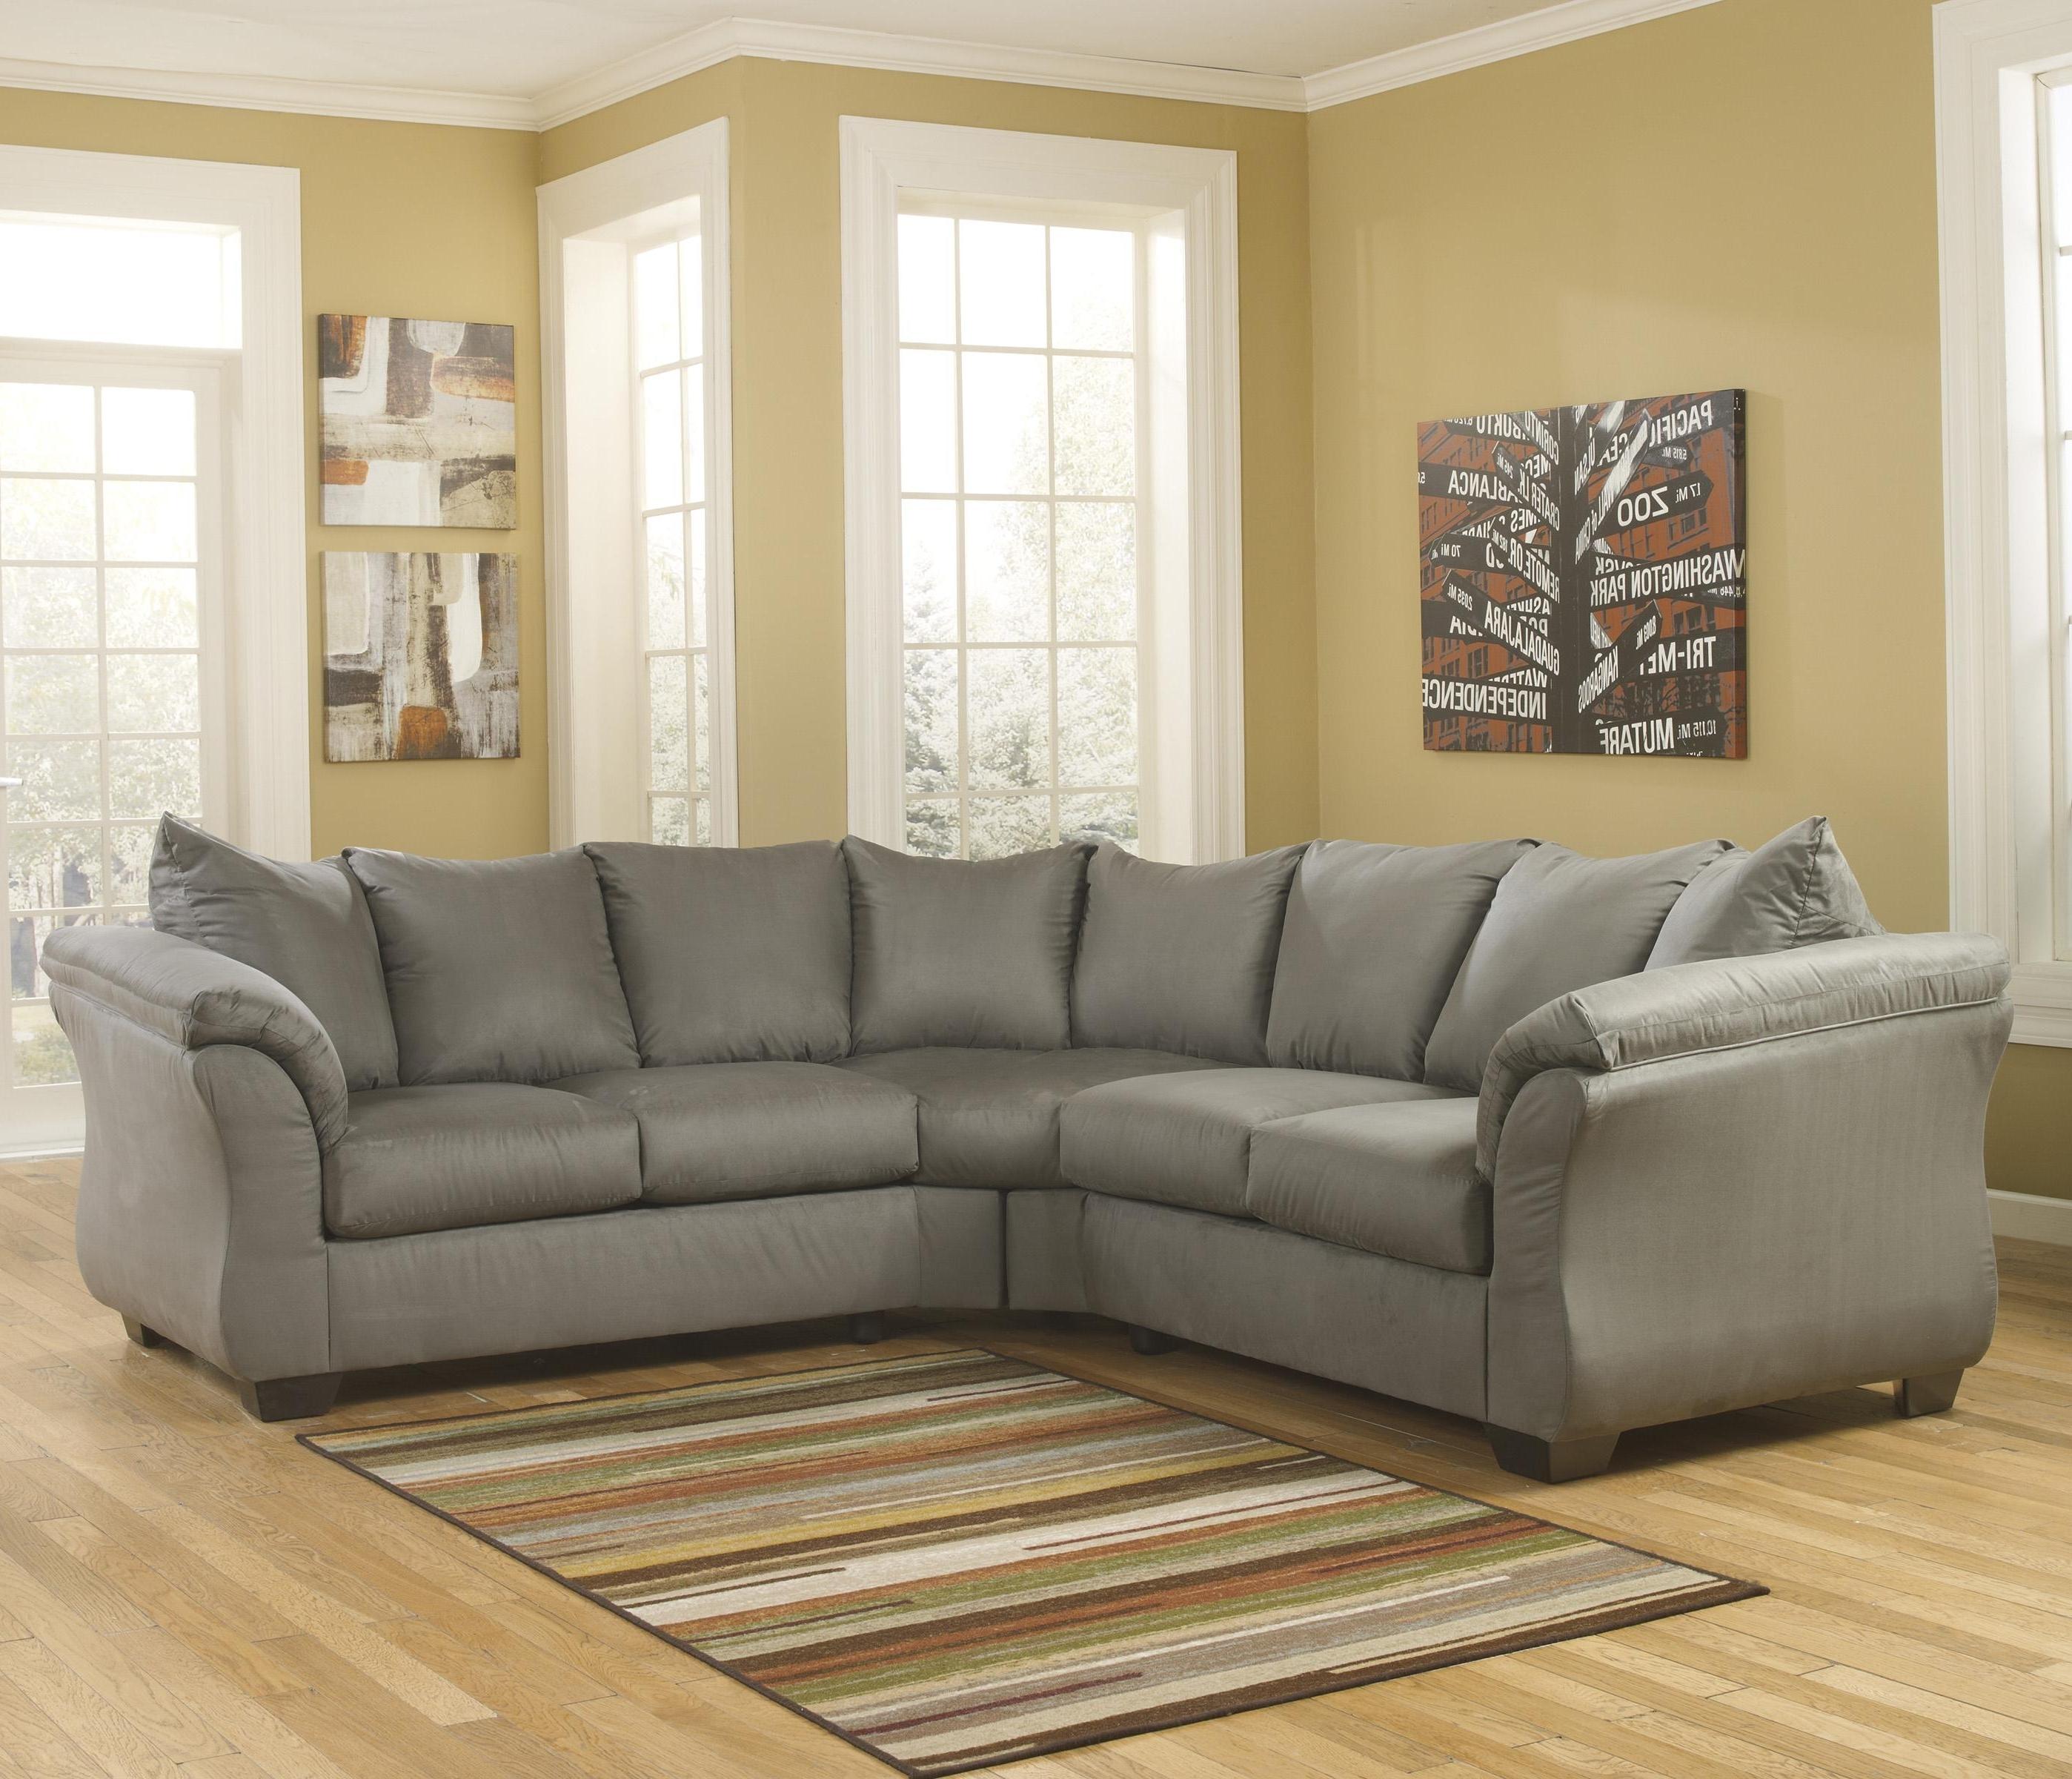 Popular Michigan Sectional Sofas Within Darcy – Cobblestone Sectional Sofasignature Designashley (View 15 of 20)